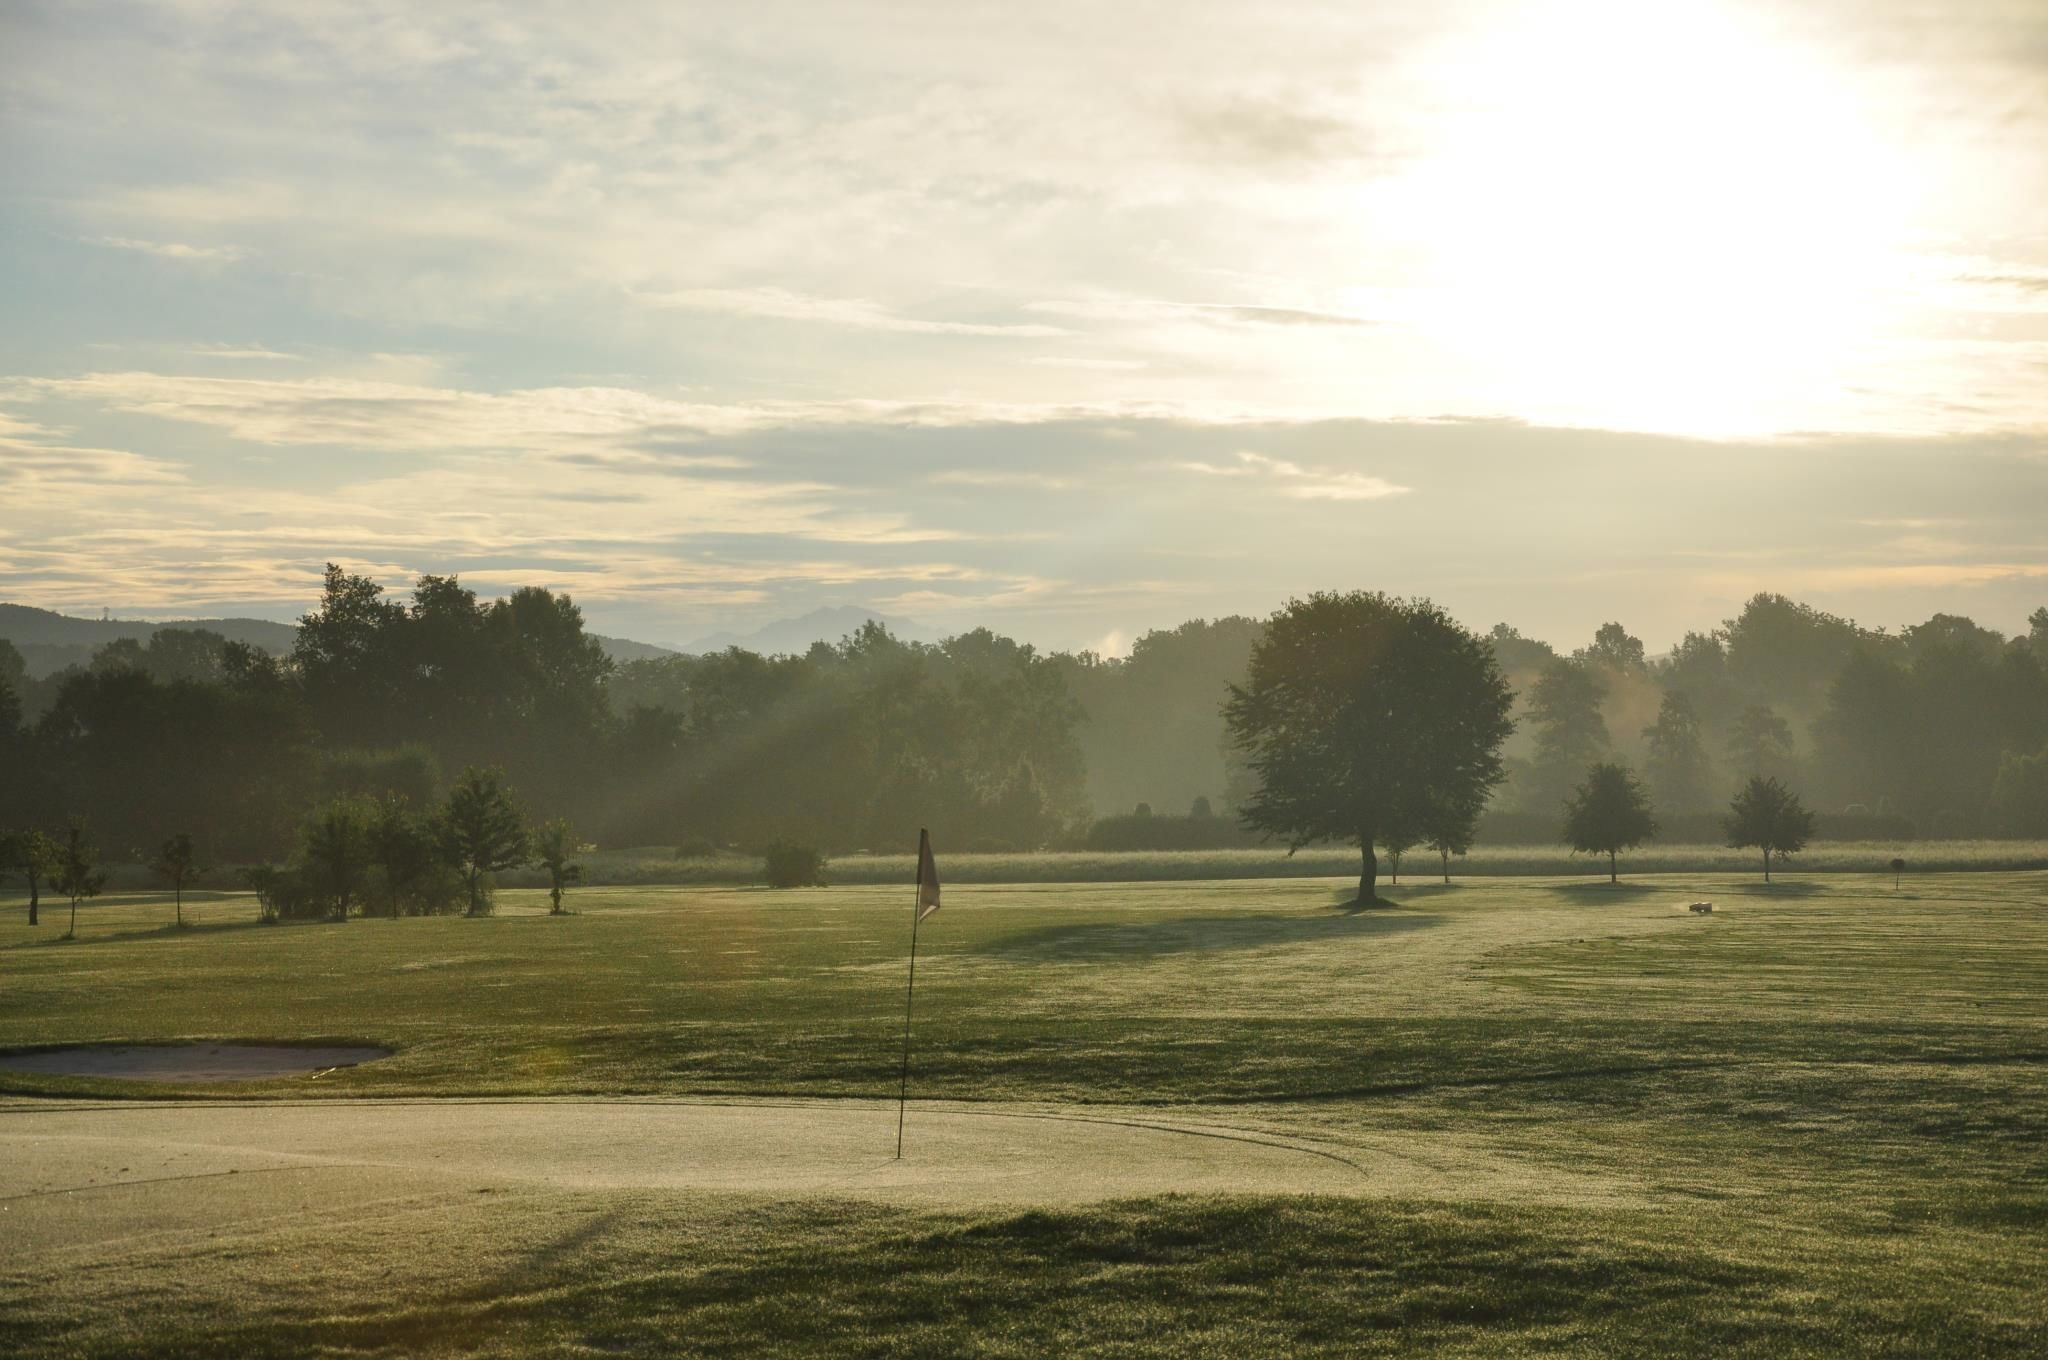 Arona golf club cover picture